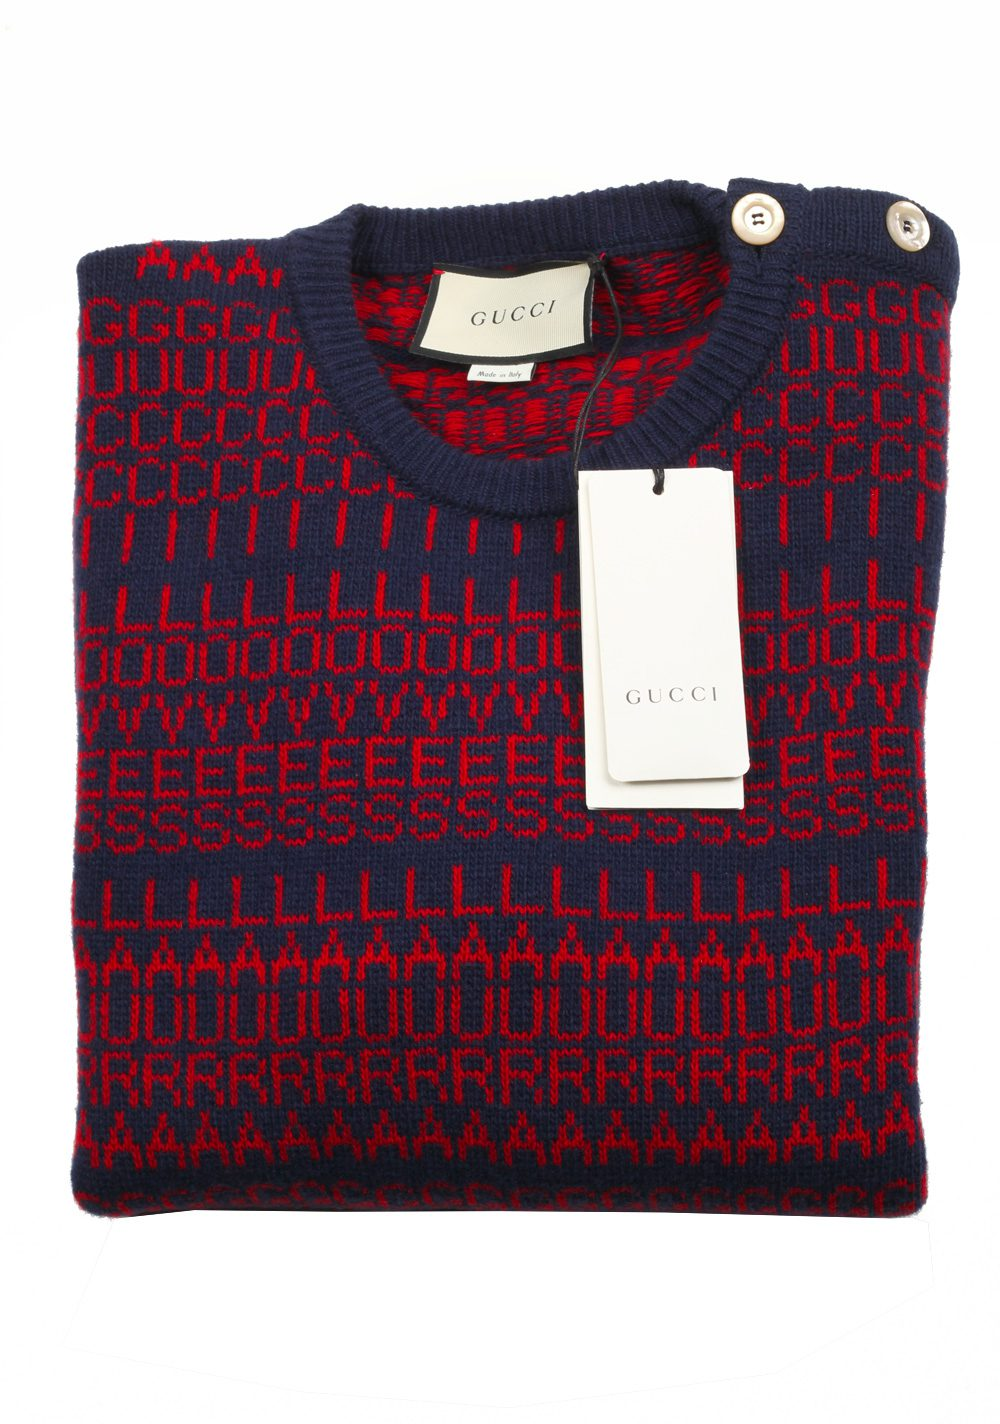 Gucci Blue Crew Neck Gucci Loves Laura Sweater Shirt Size XL / 40R U.S.   Costume Limité